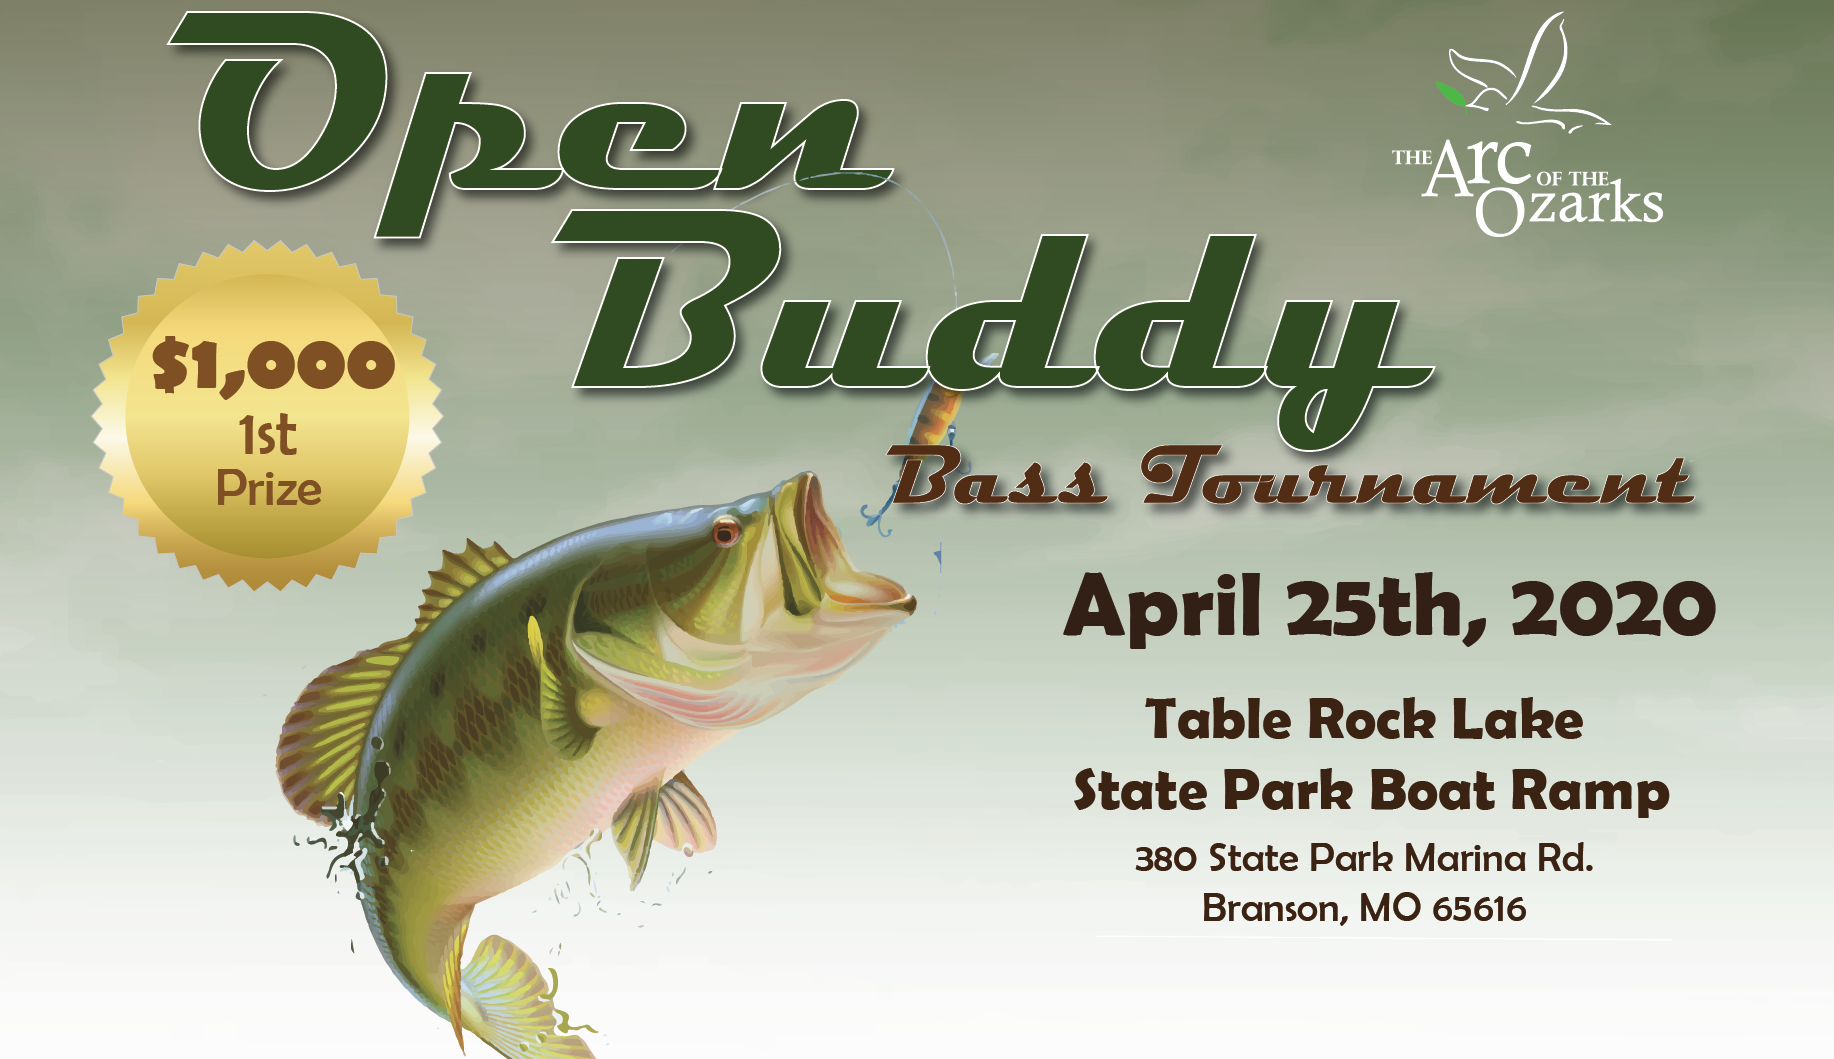 Fishing tournament in Branson, MO